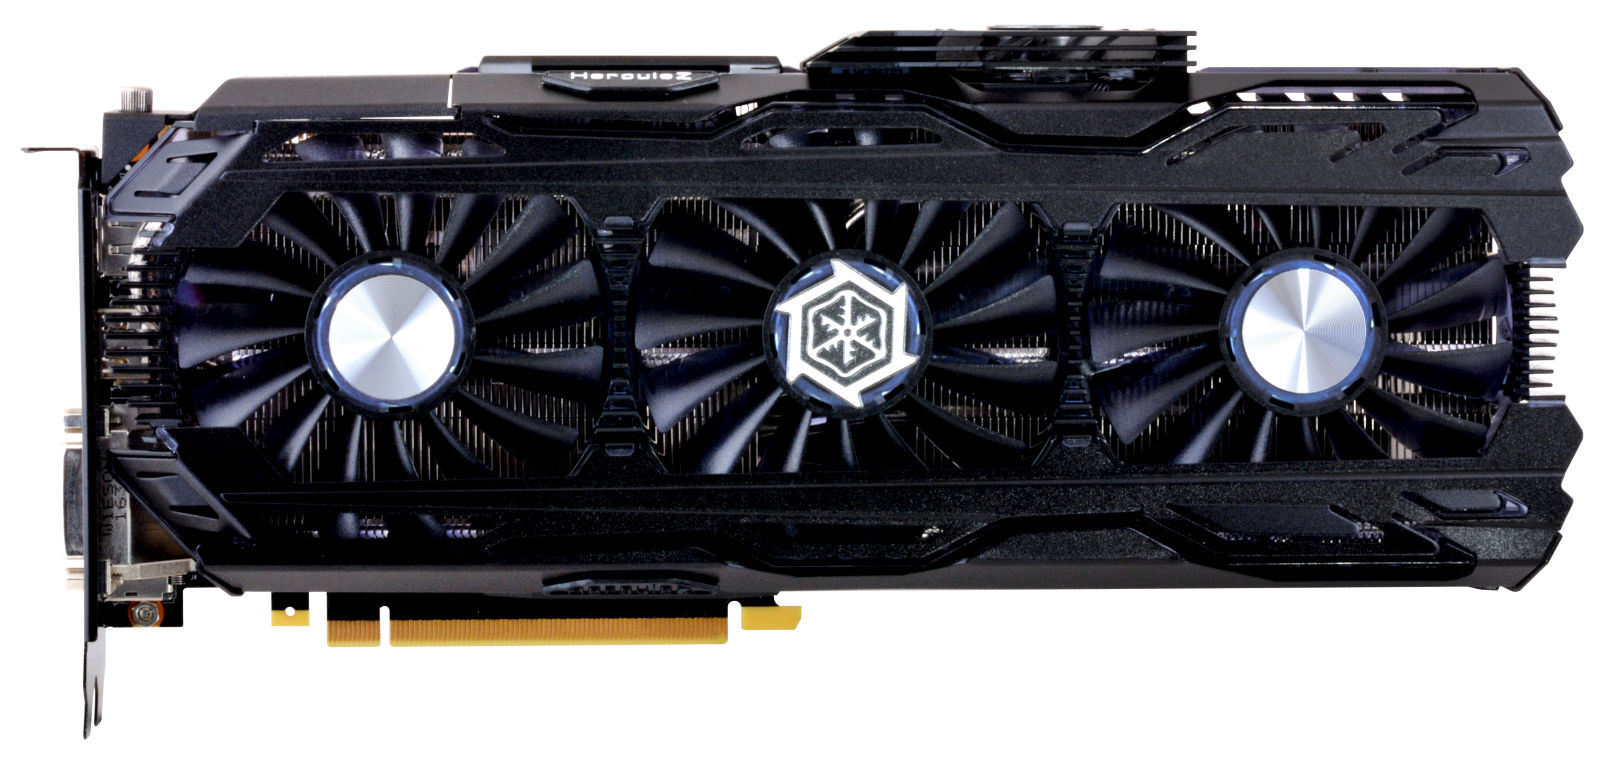 Inno3D GeForce GTX 1080 Ti IChill X3 and iChill X4 Graphics